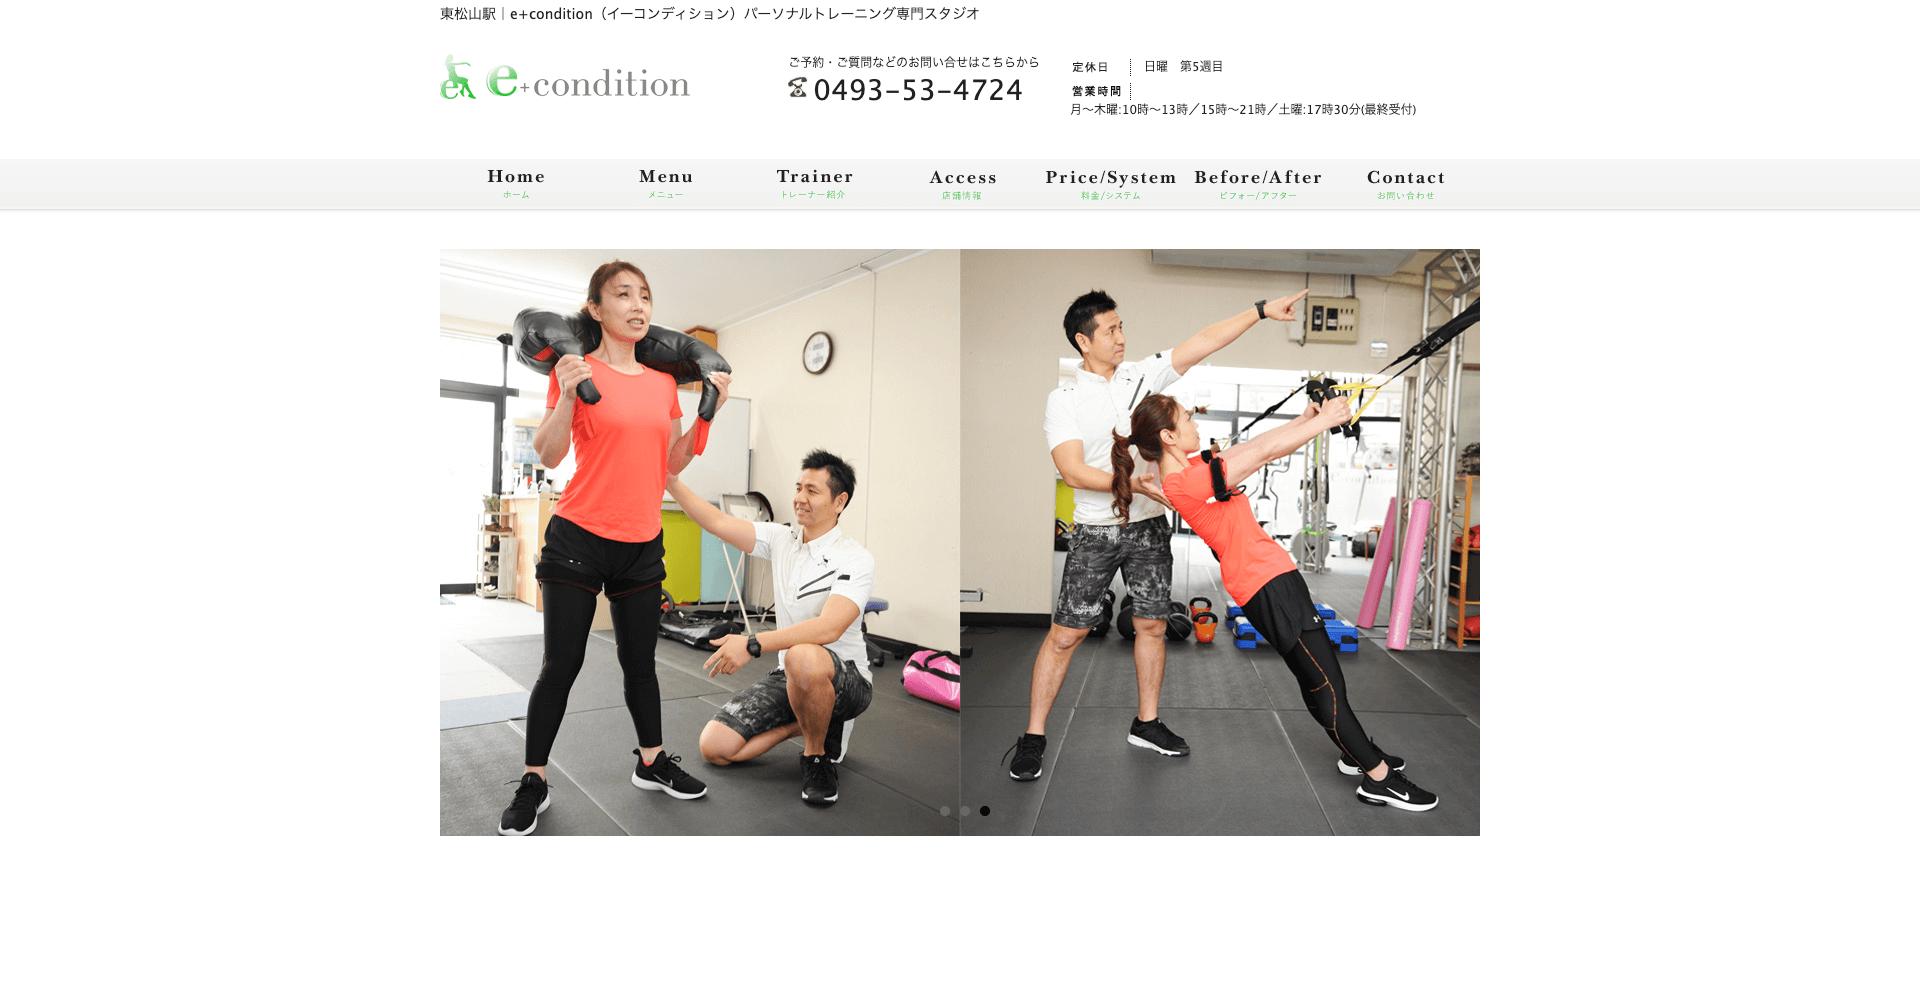 【e+condition(イーコンディション)】東松山市ダイエット・加圧トレーニングなら、お任せ下さい。